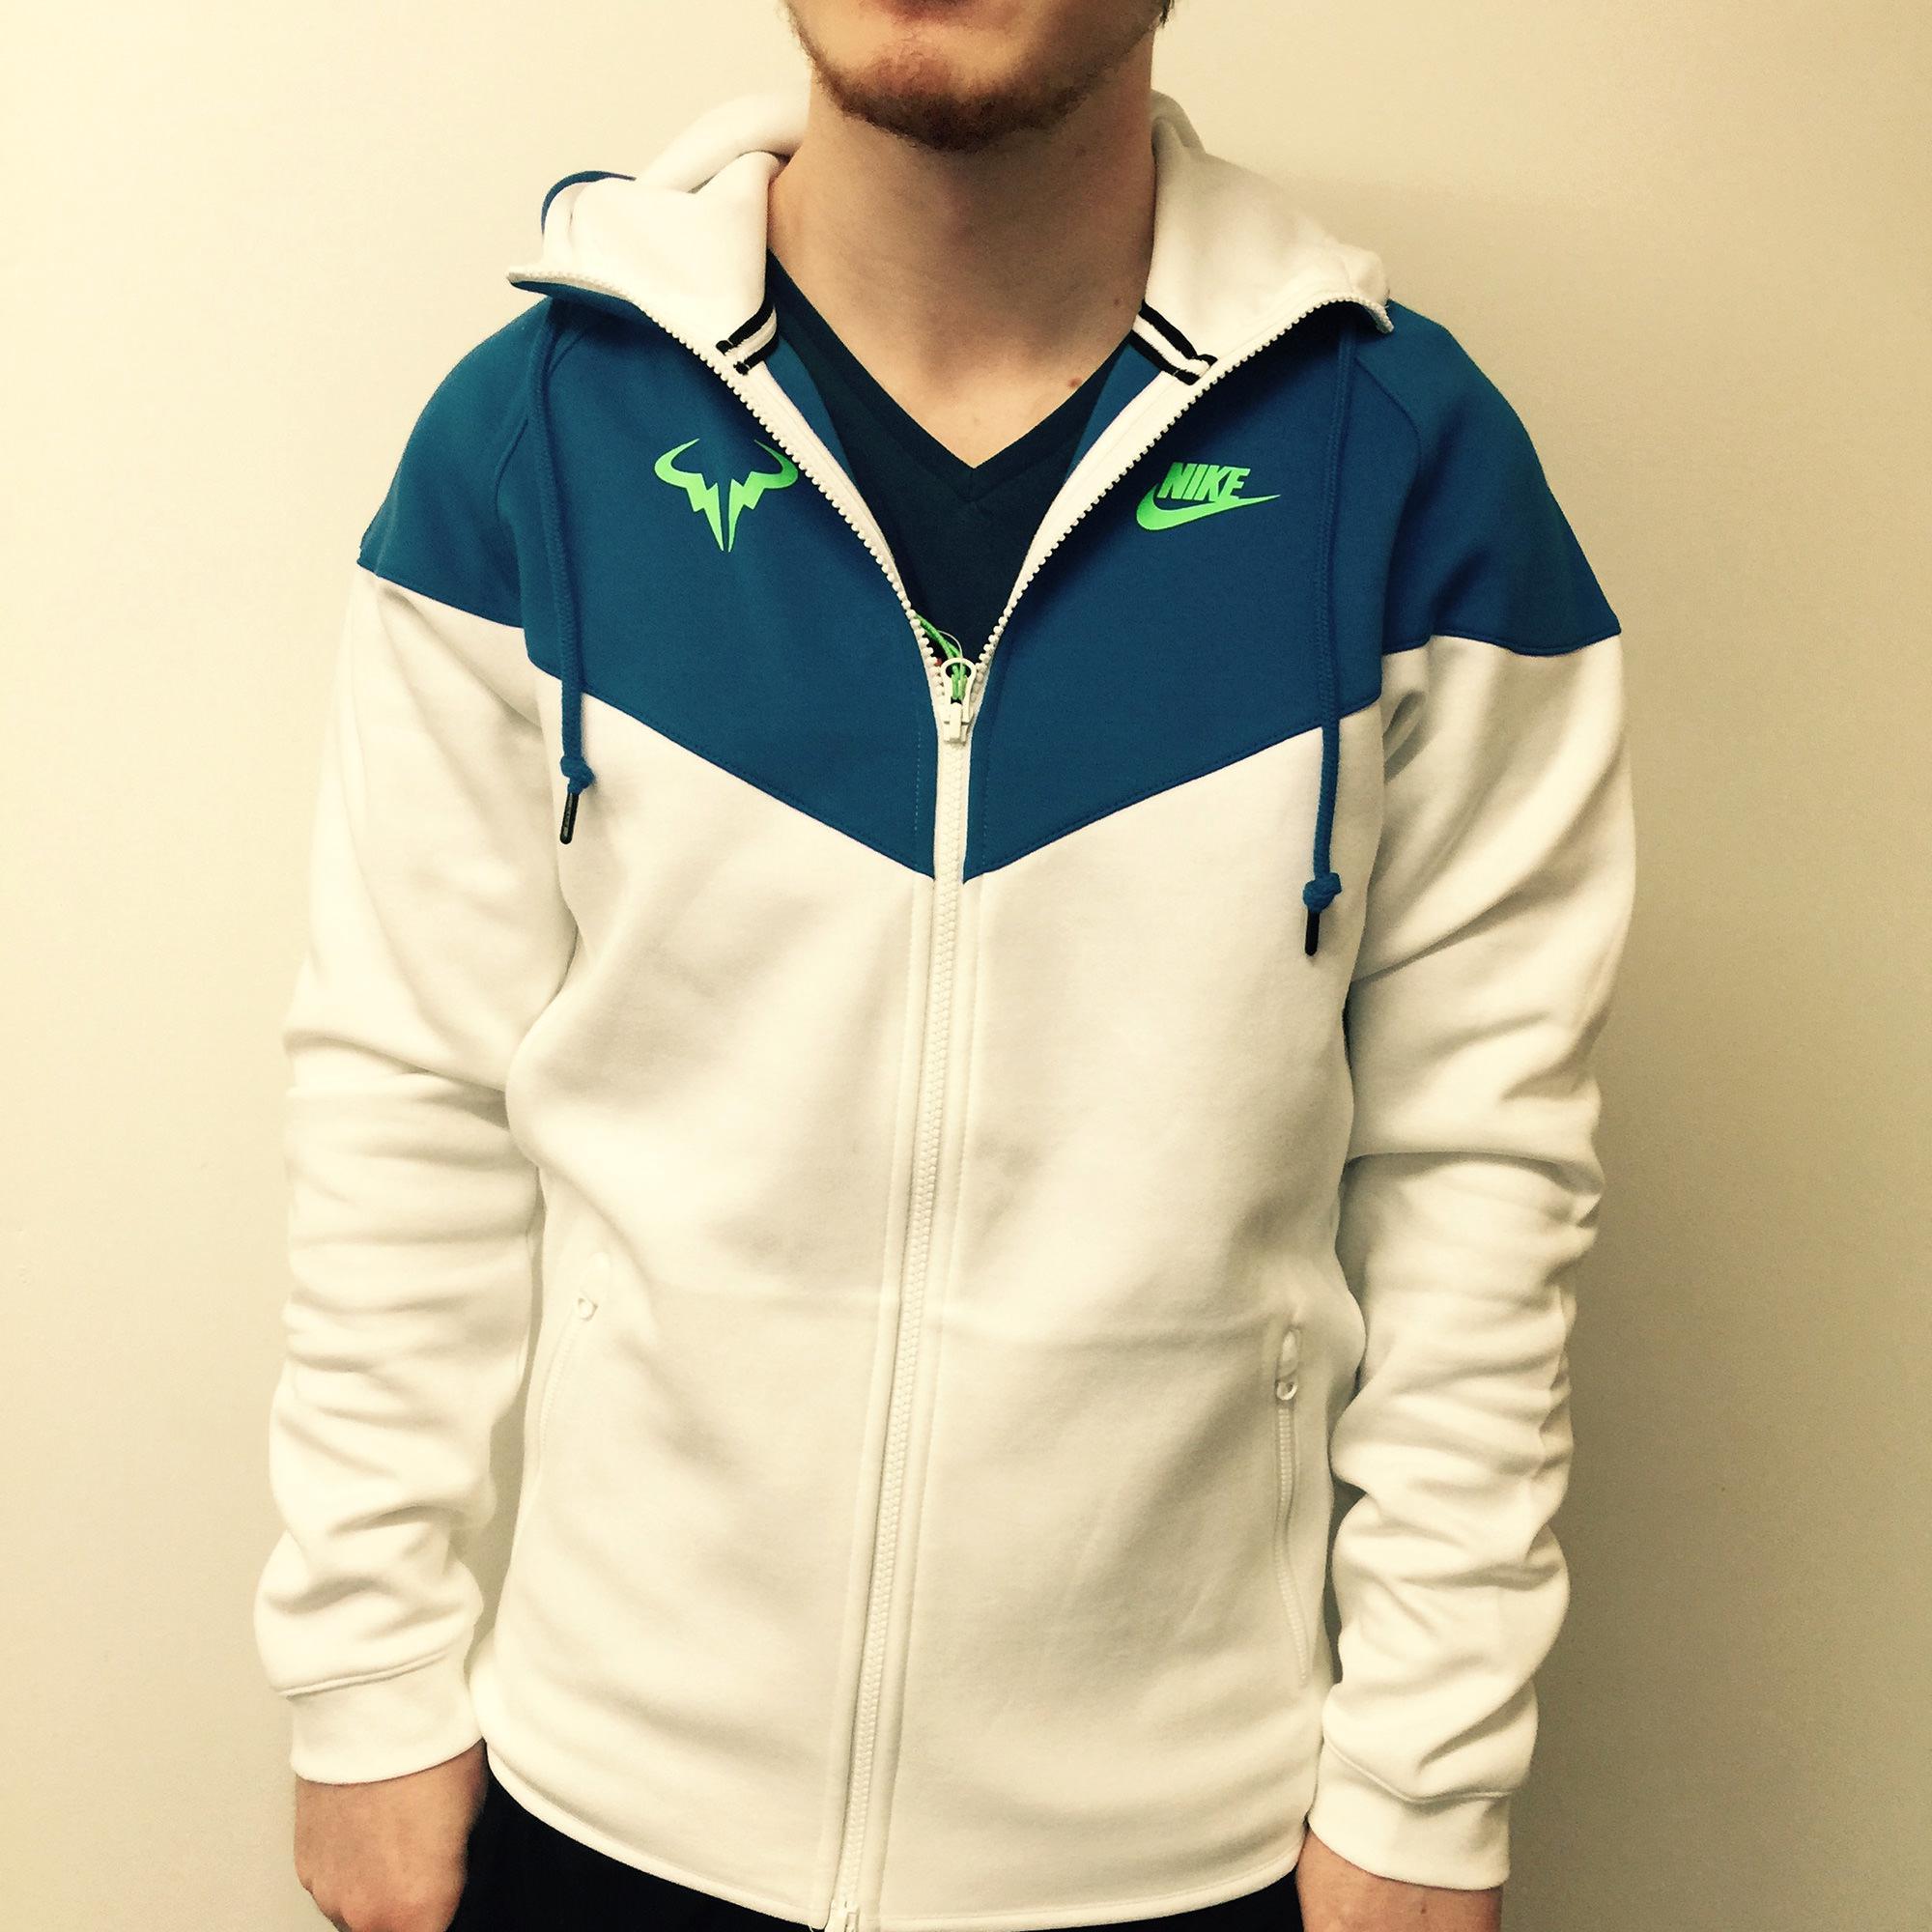 04d184dca0e2 Nike Mens Premier Rafa Jacket - White Soar Green Strike - Tennisnuts.com